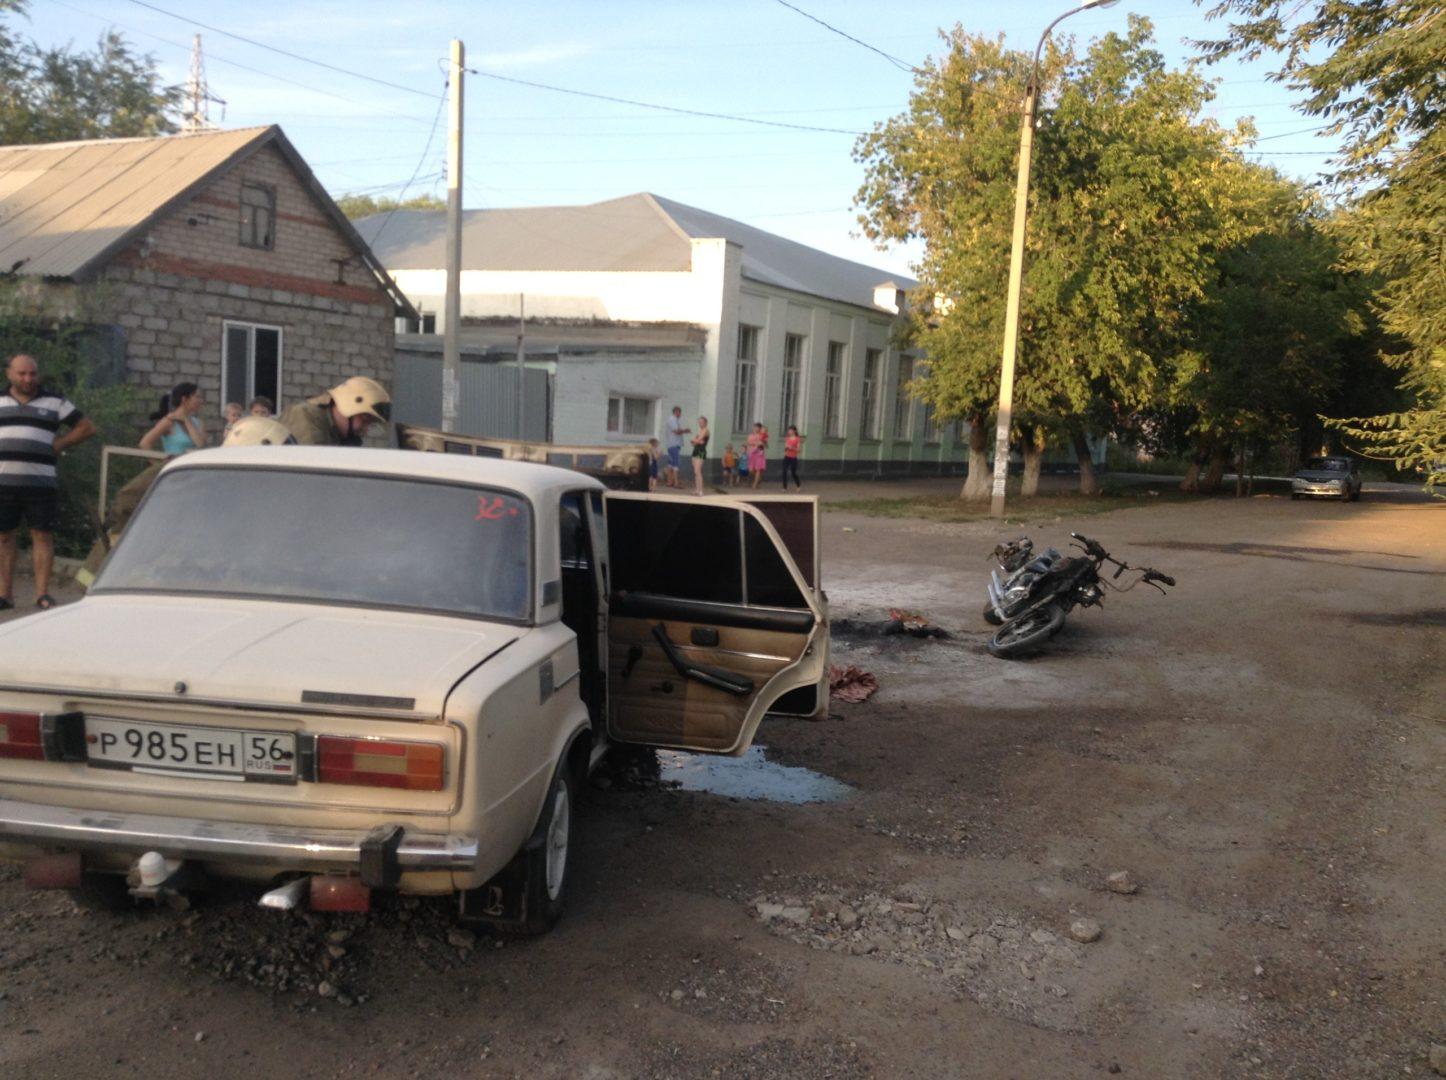 ДТП вОренбурге: ВАЗ сбил мотоциклиста и зажегся, шофёр убежал